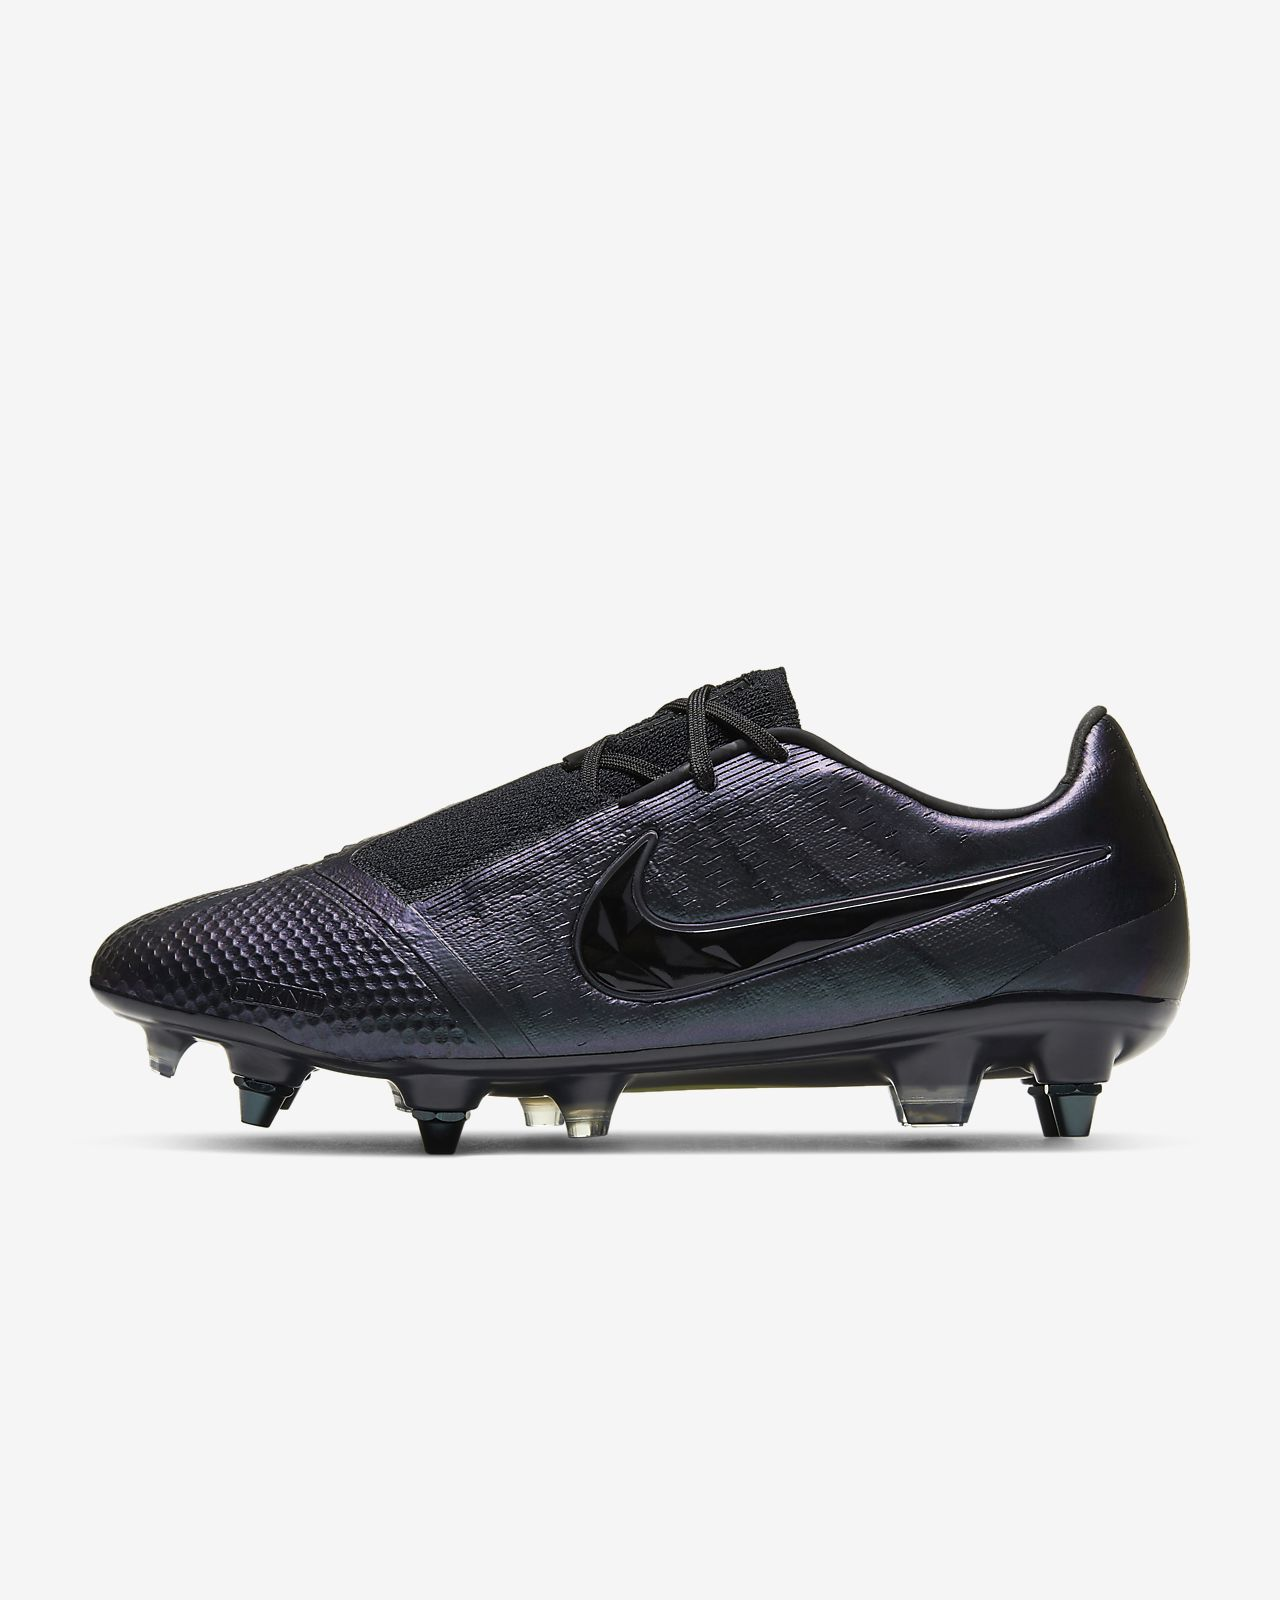 Nike Phantom Venom K b Phantom VNM fodboldst vler hos